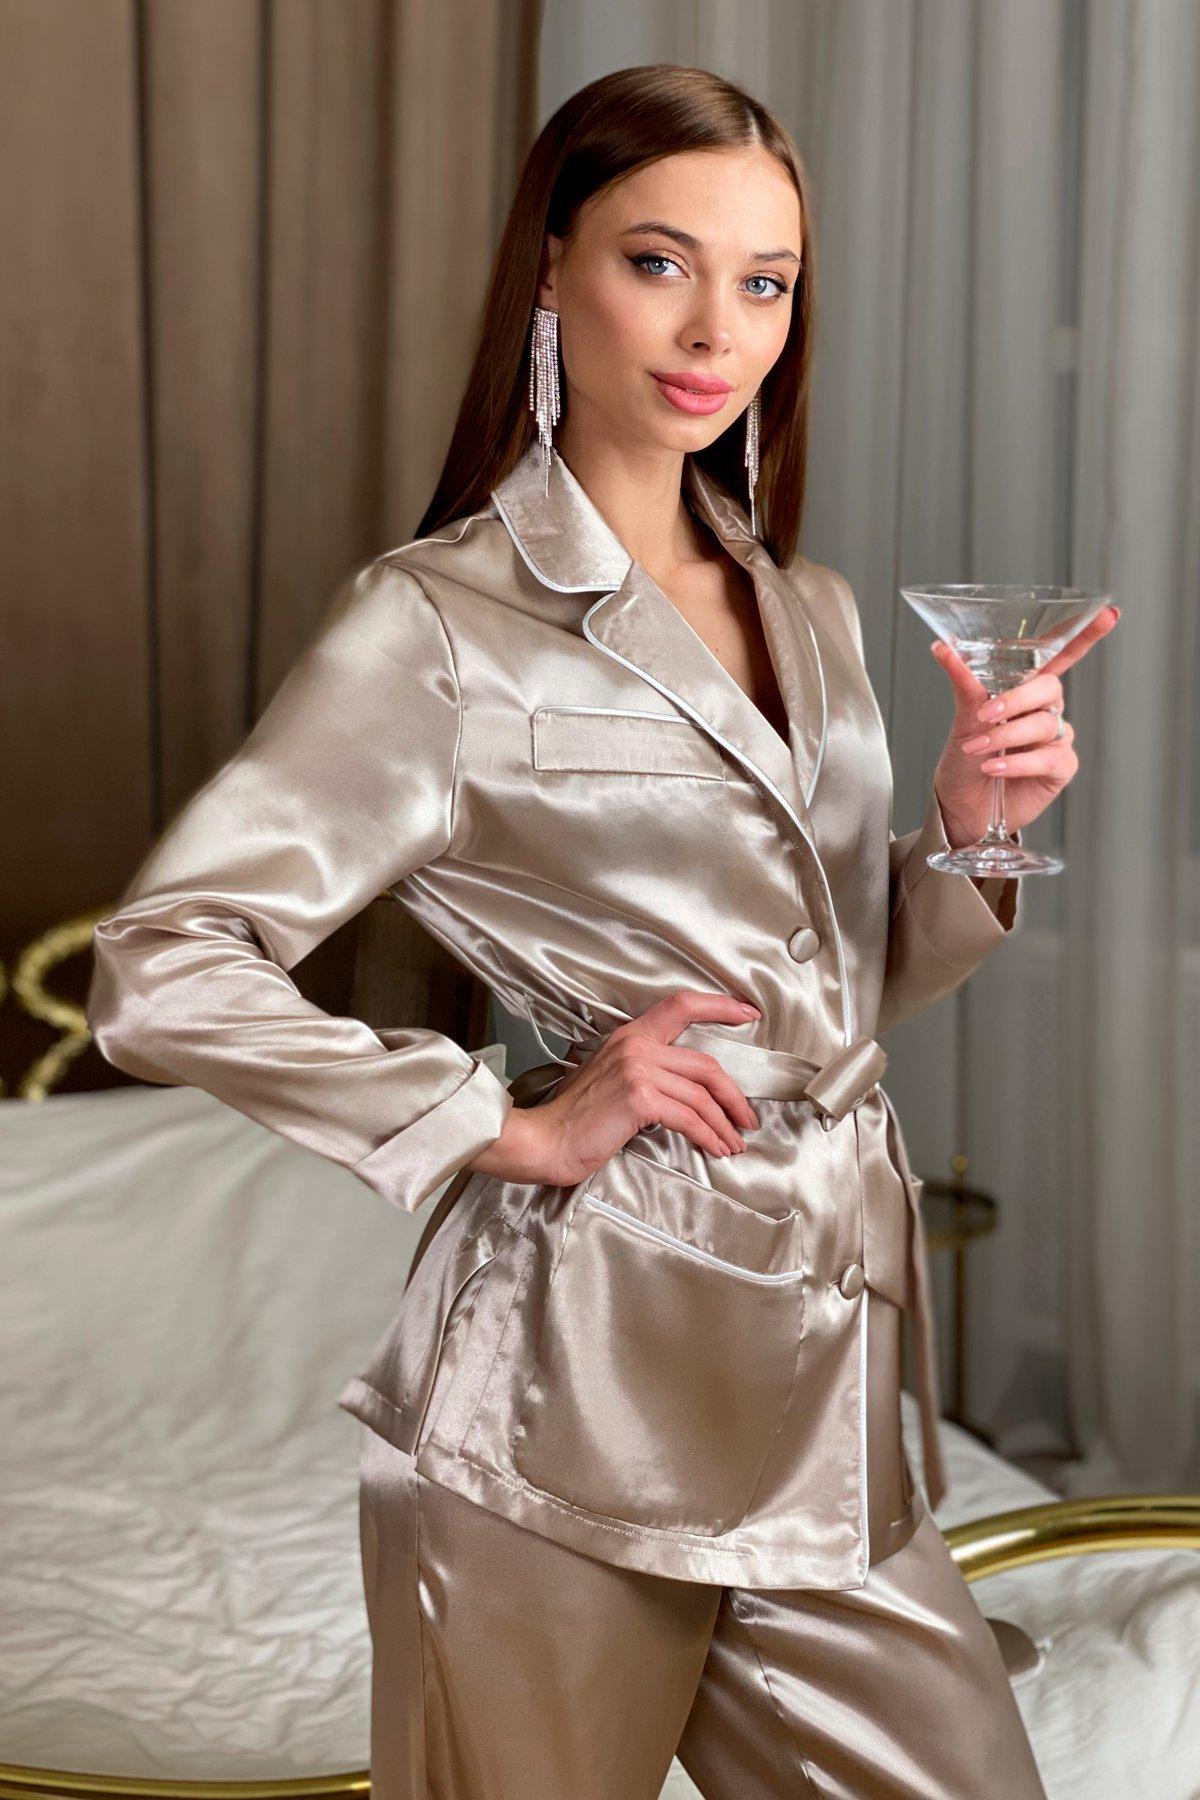 Шайн пижама из шелка 10446 АРТ. 46758 Цвет: Бежевый - фото 6, интернет магазин tm-modus.ru